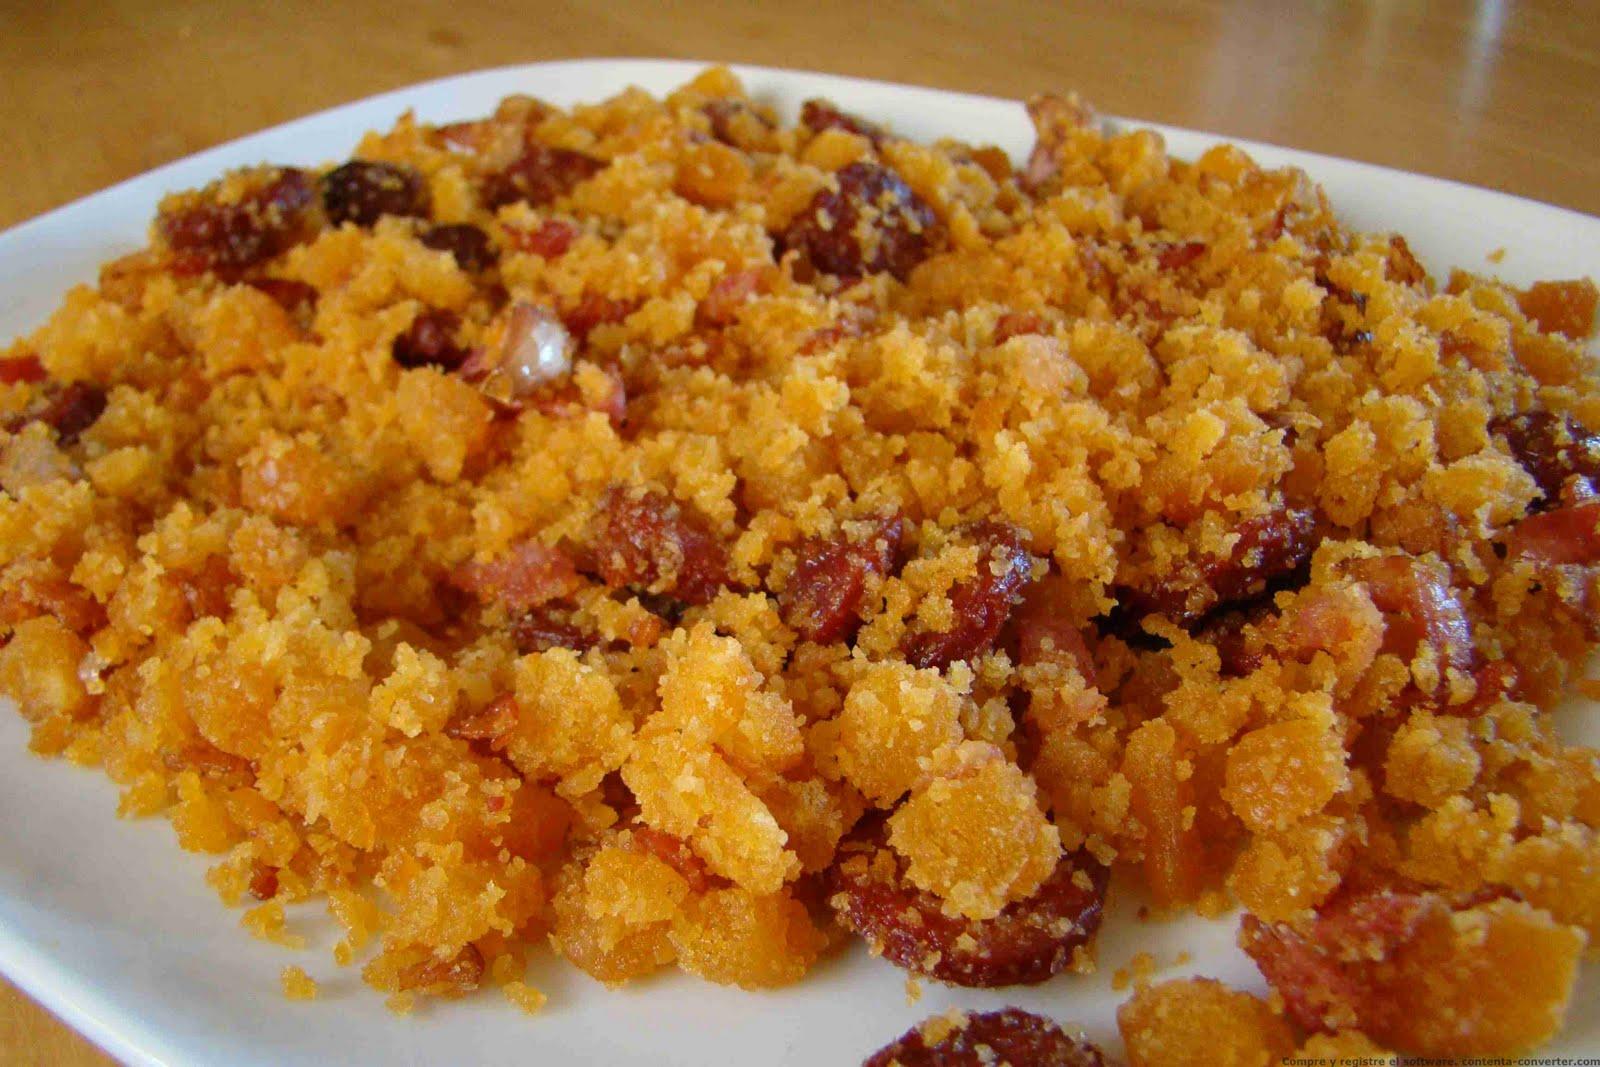 Gastronomía del Valle del Tiétar - Migas - TiétarTeVe